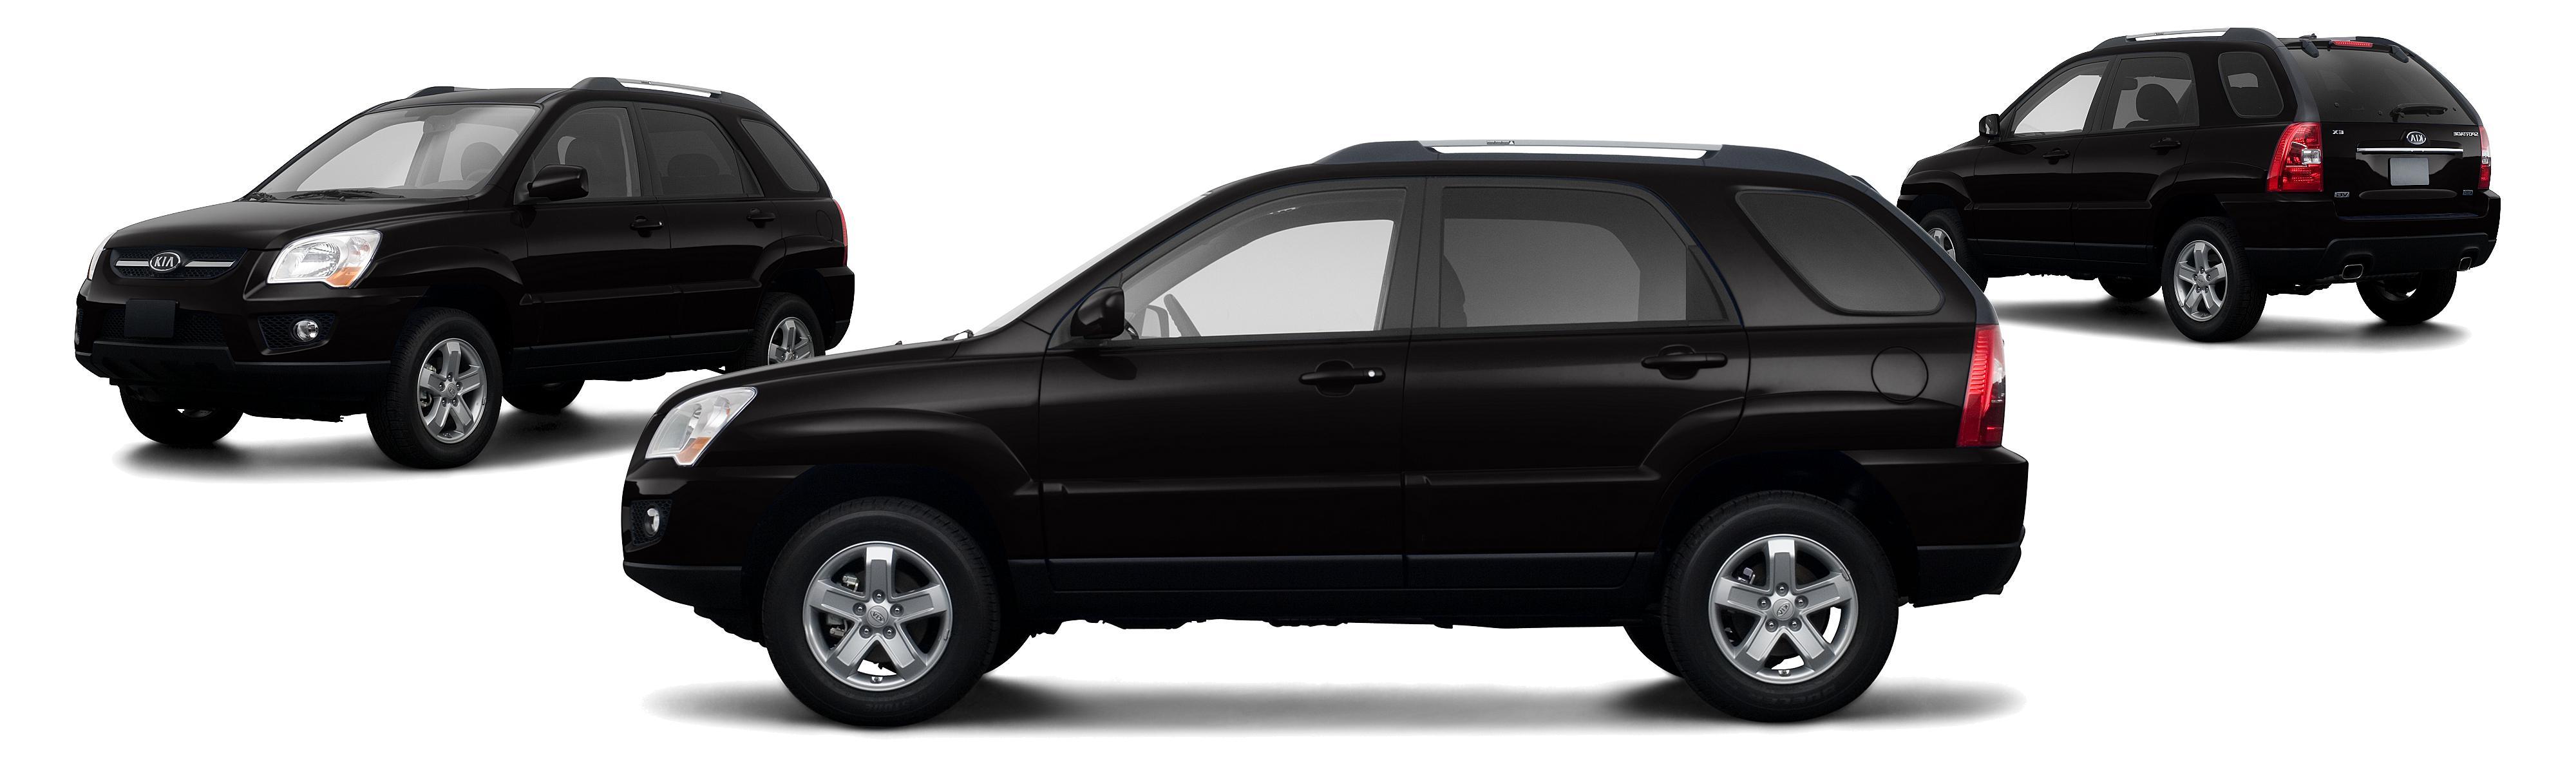 vehicle inventory action sportage rouyn awd used ex en kia quebec in noranda